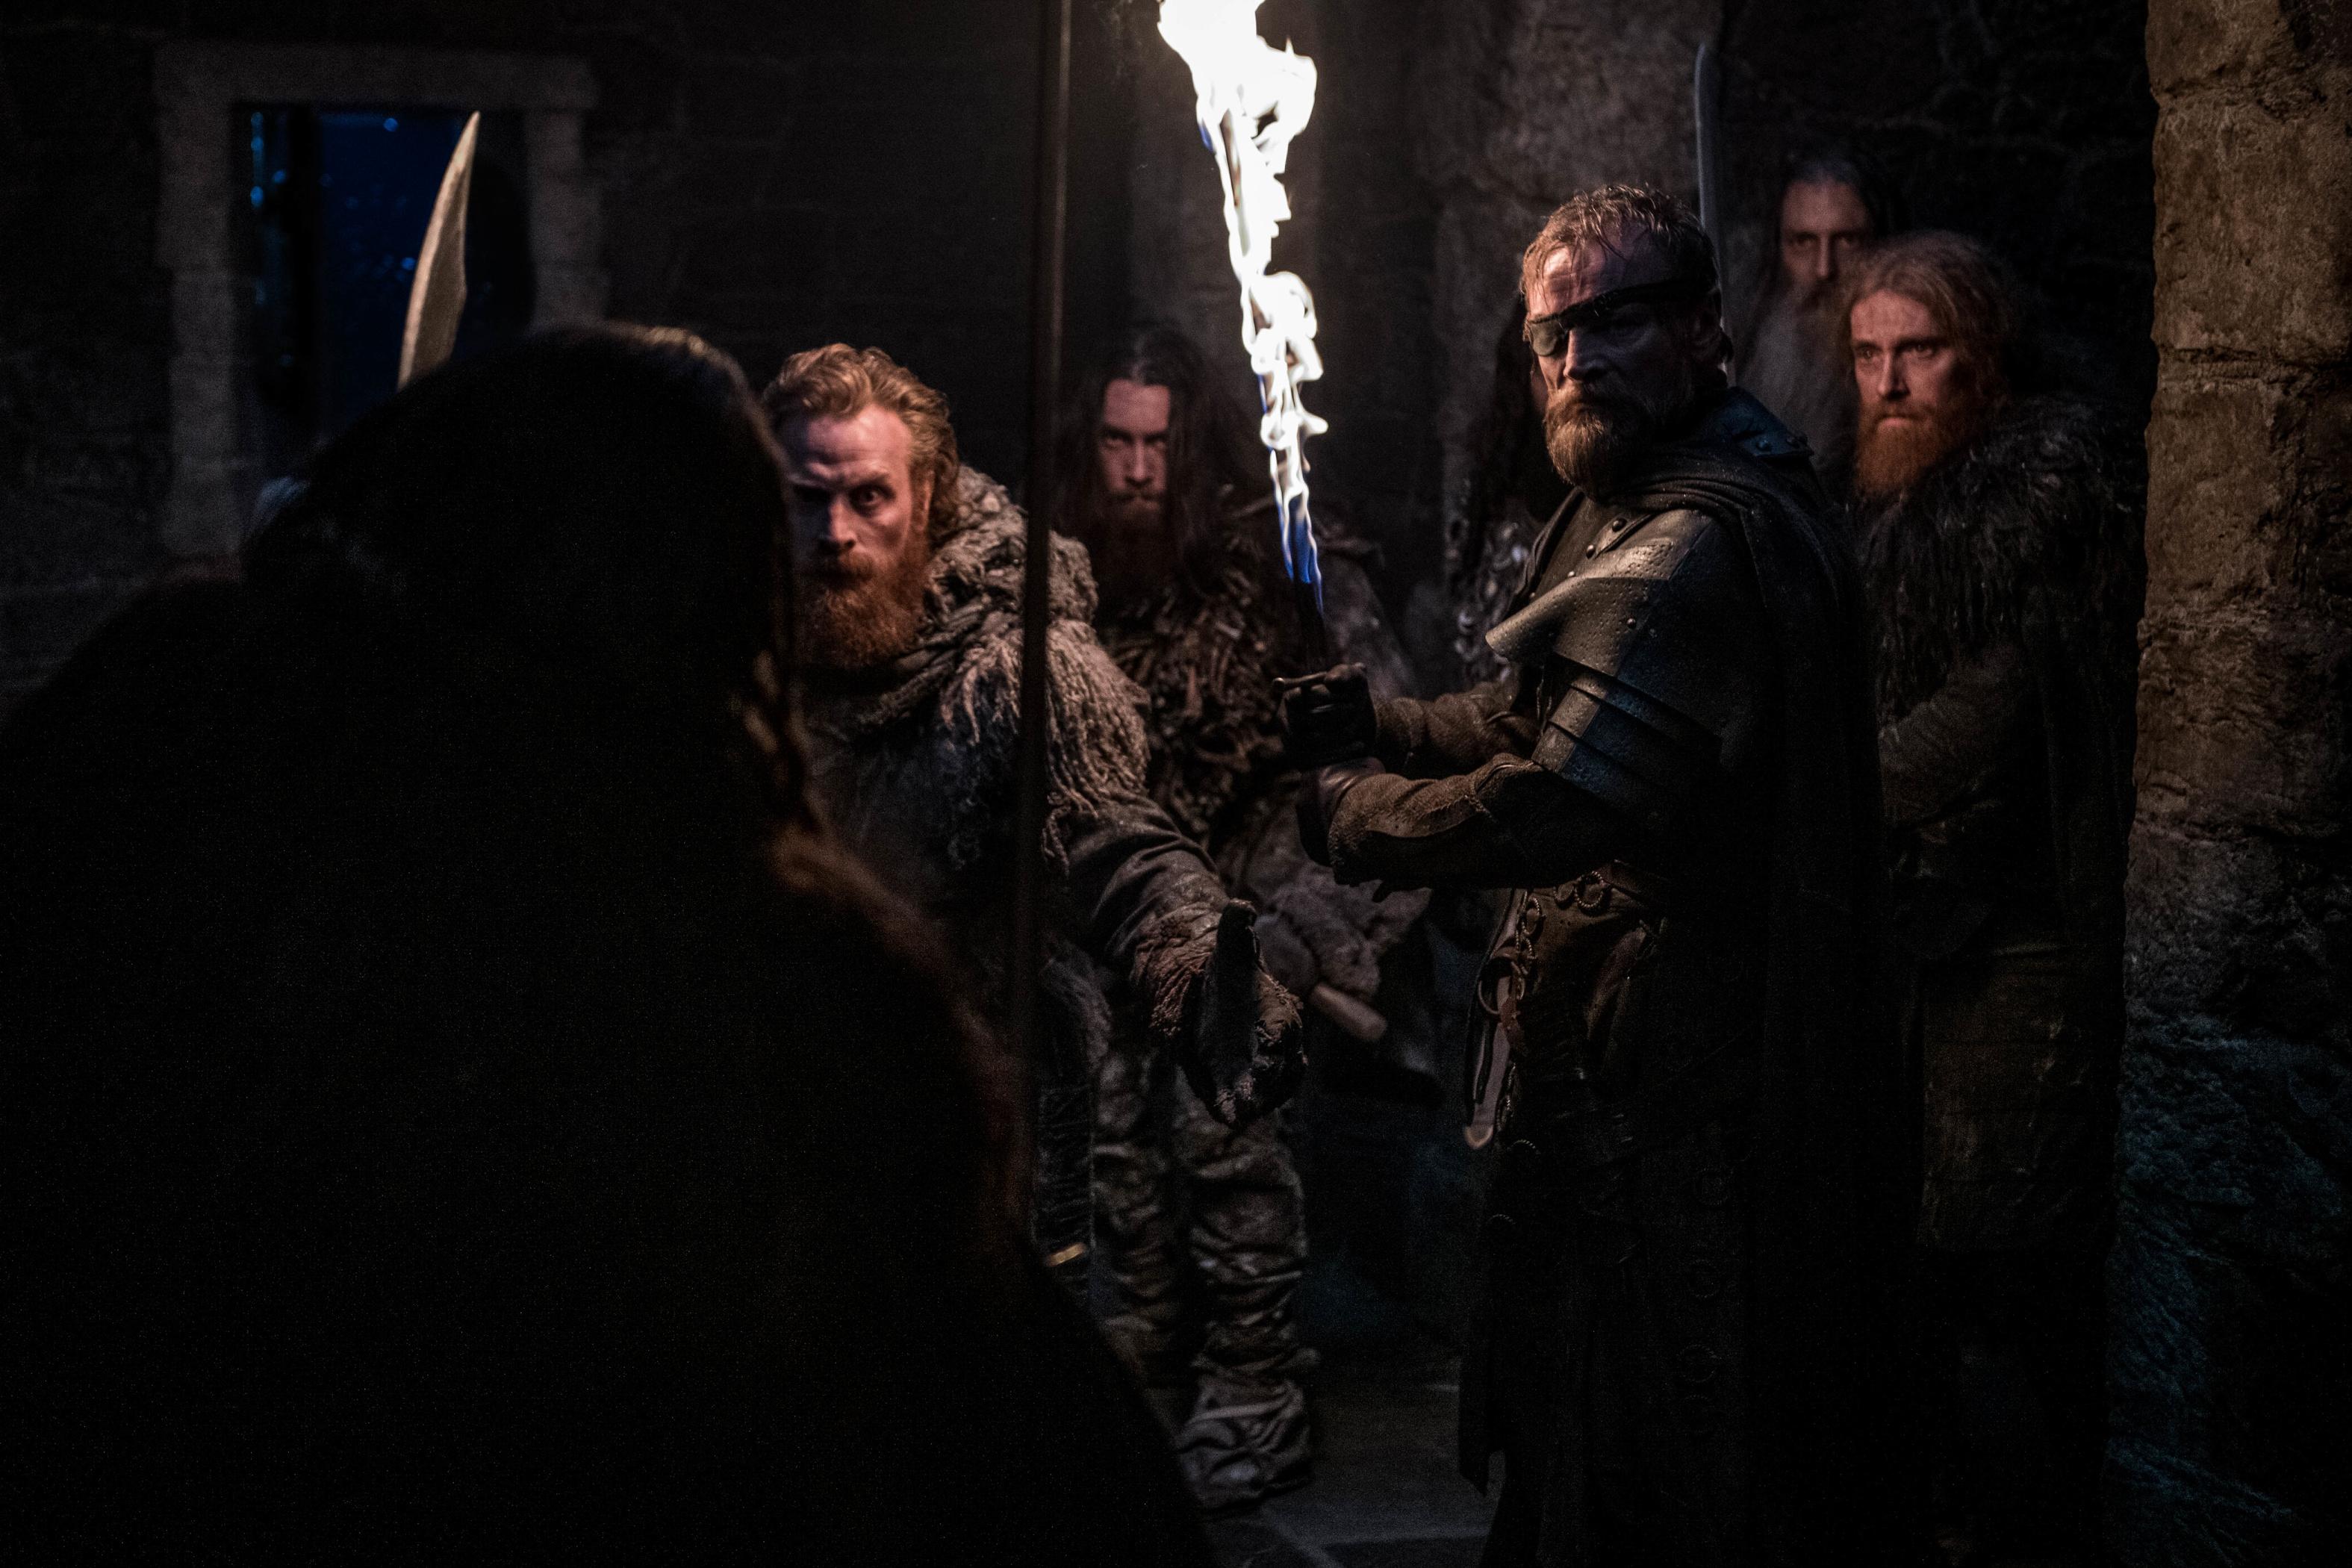 8x01 ~ Winterfell ~ Tormund and Beric